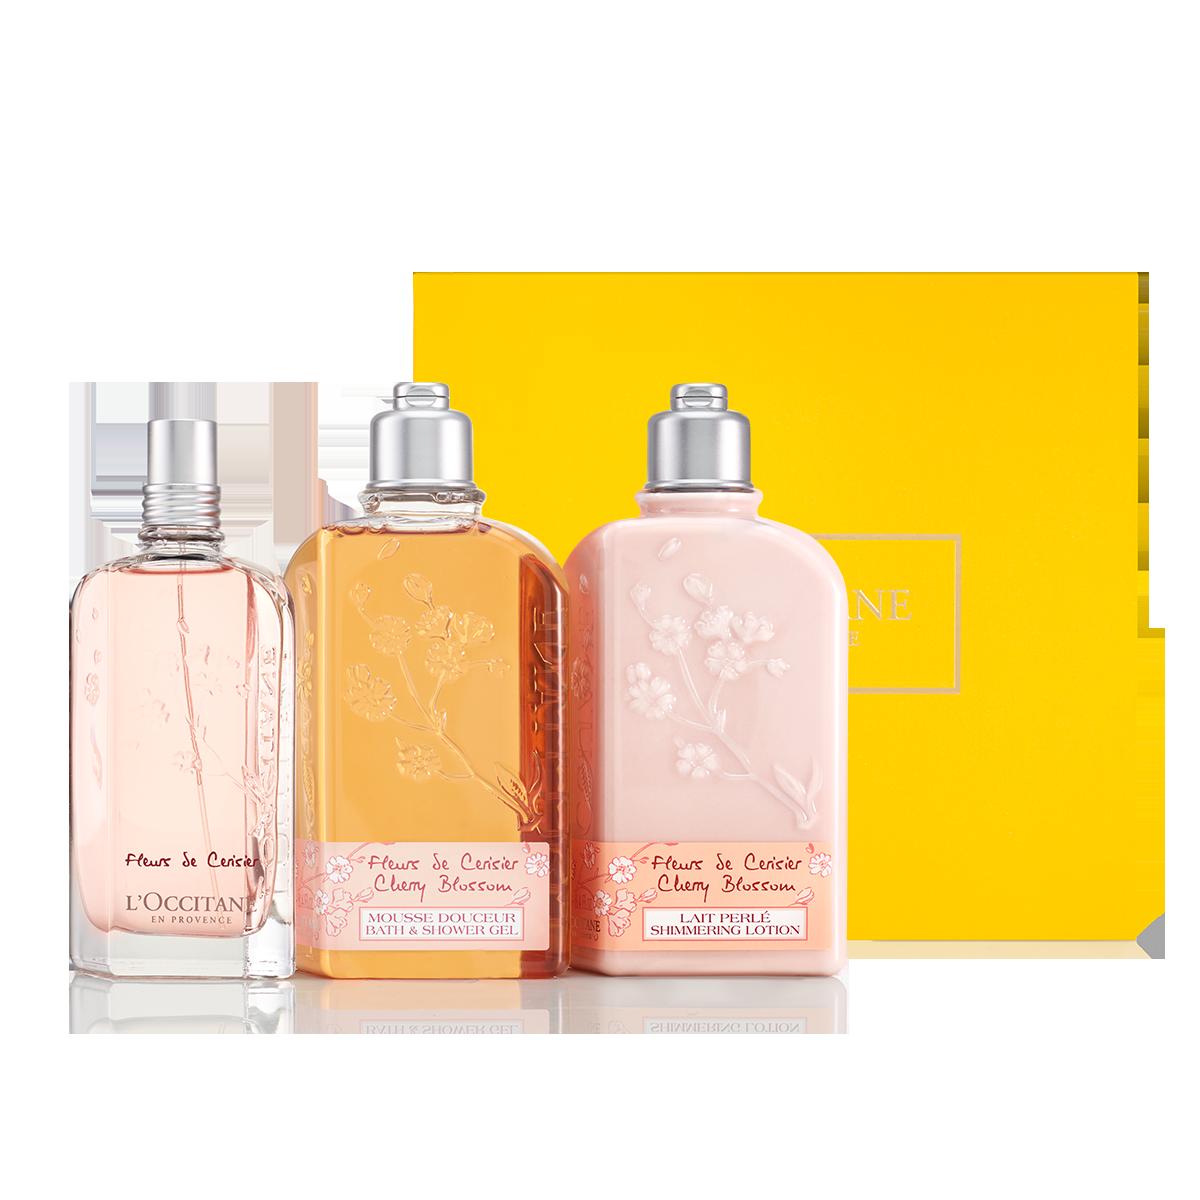 Cherry Blossom Fragrance Collection - L'Occitane